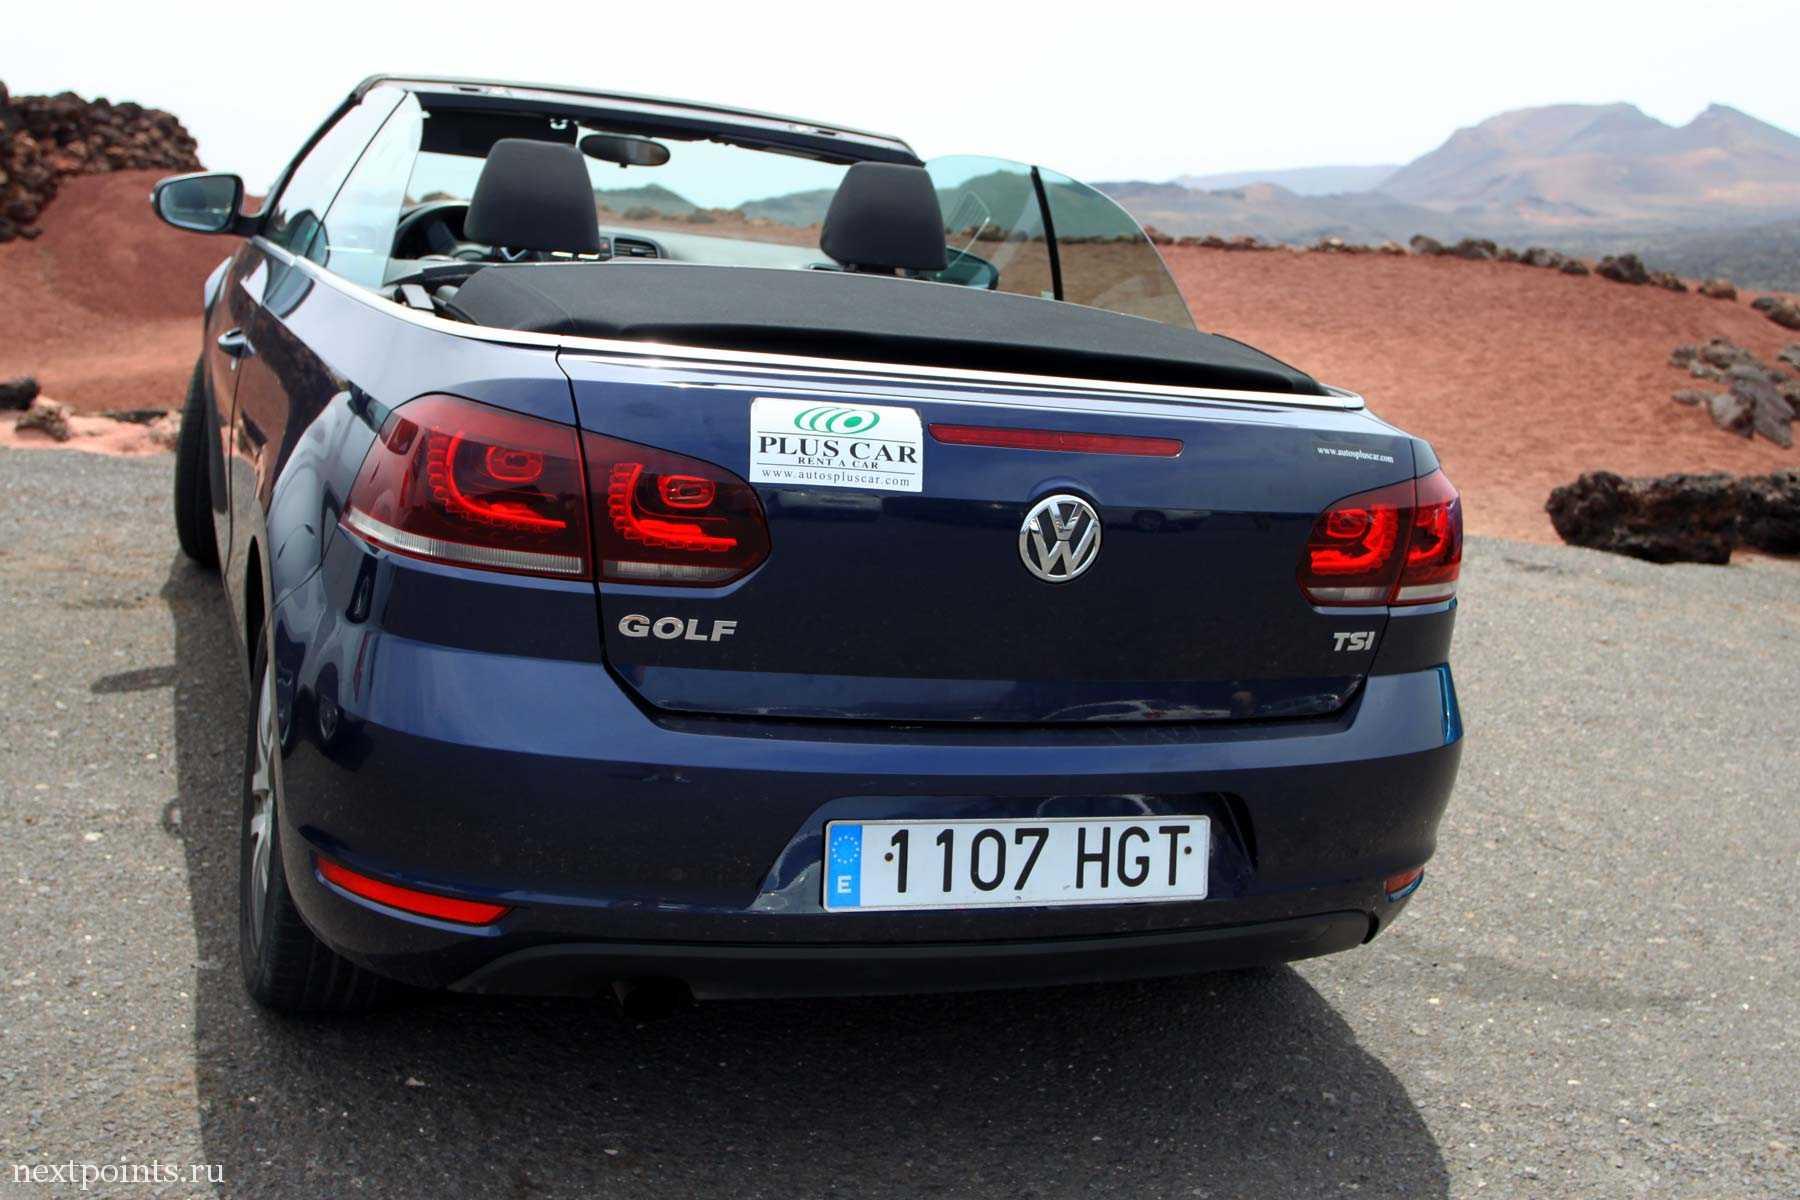 Volvo на Лансароте. Парковка Национального парка Timanfaya. Plus Car.